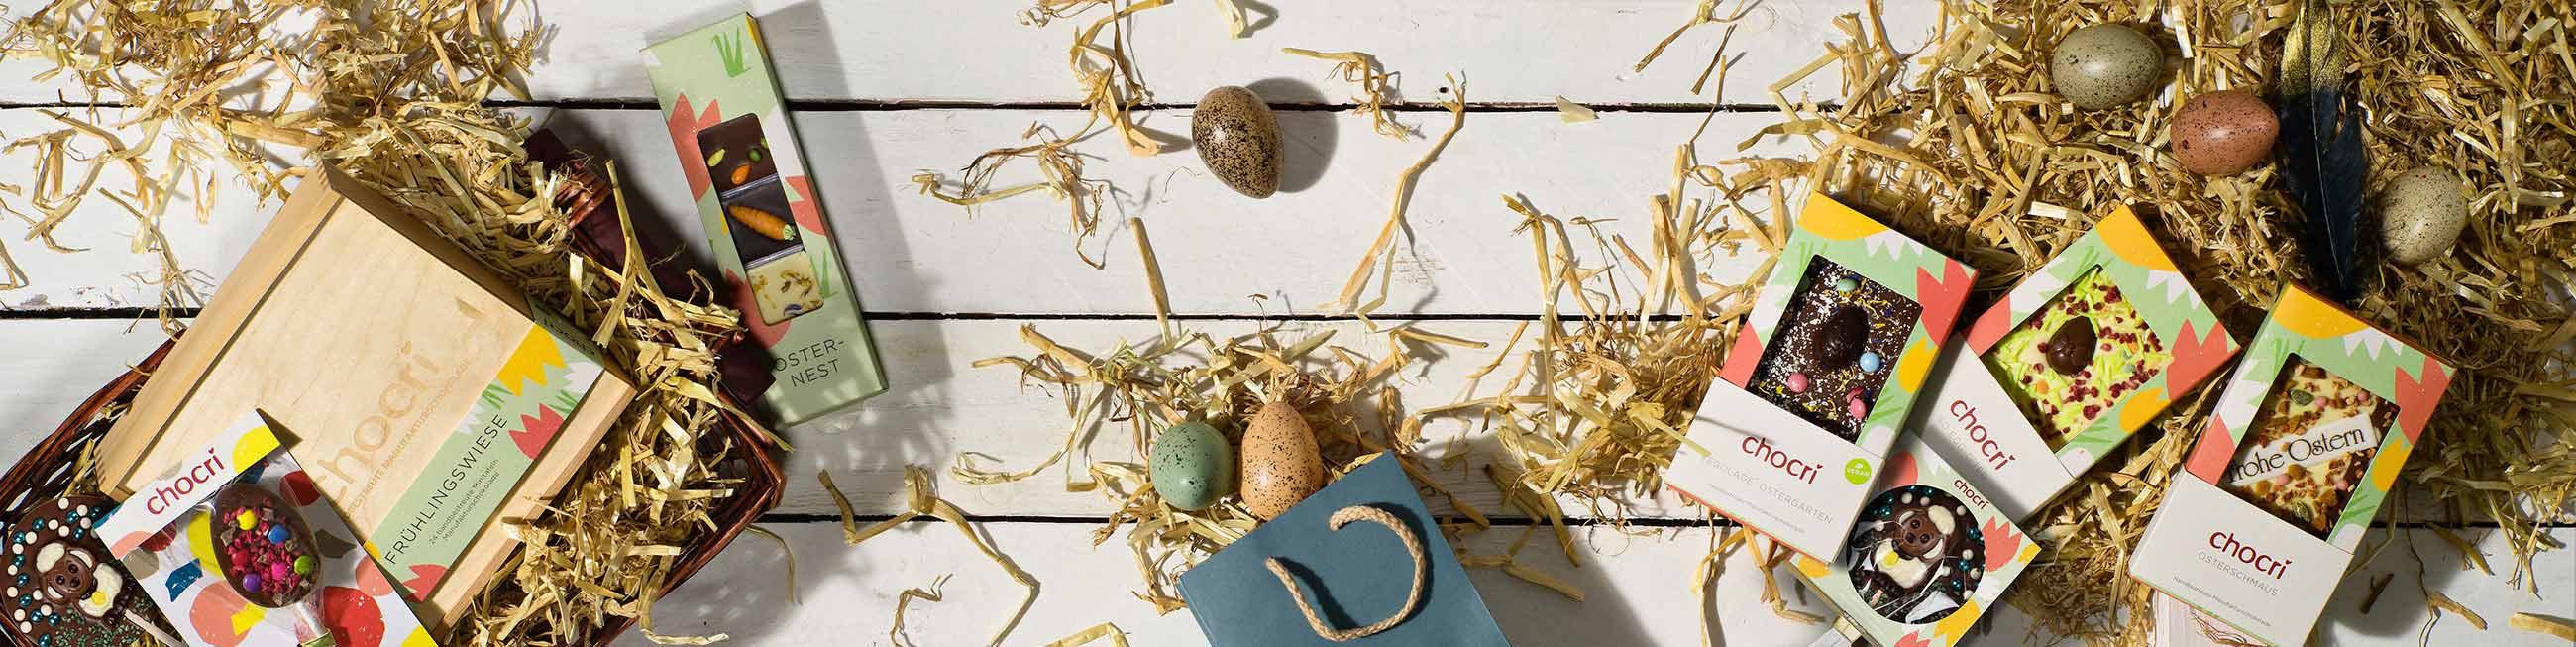 chocri Osterschokolade zum Osterfest